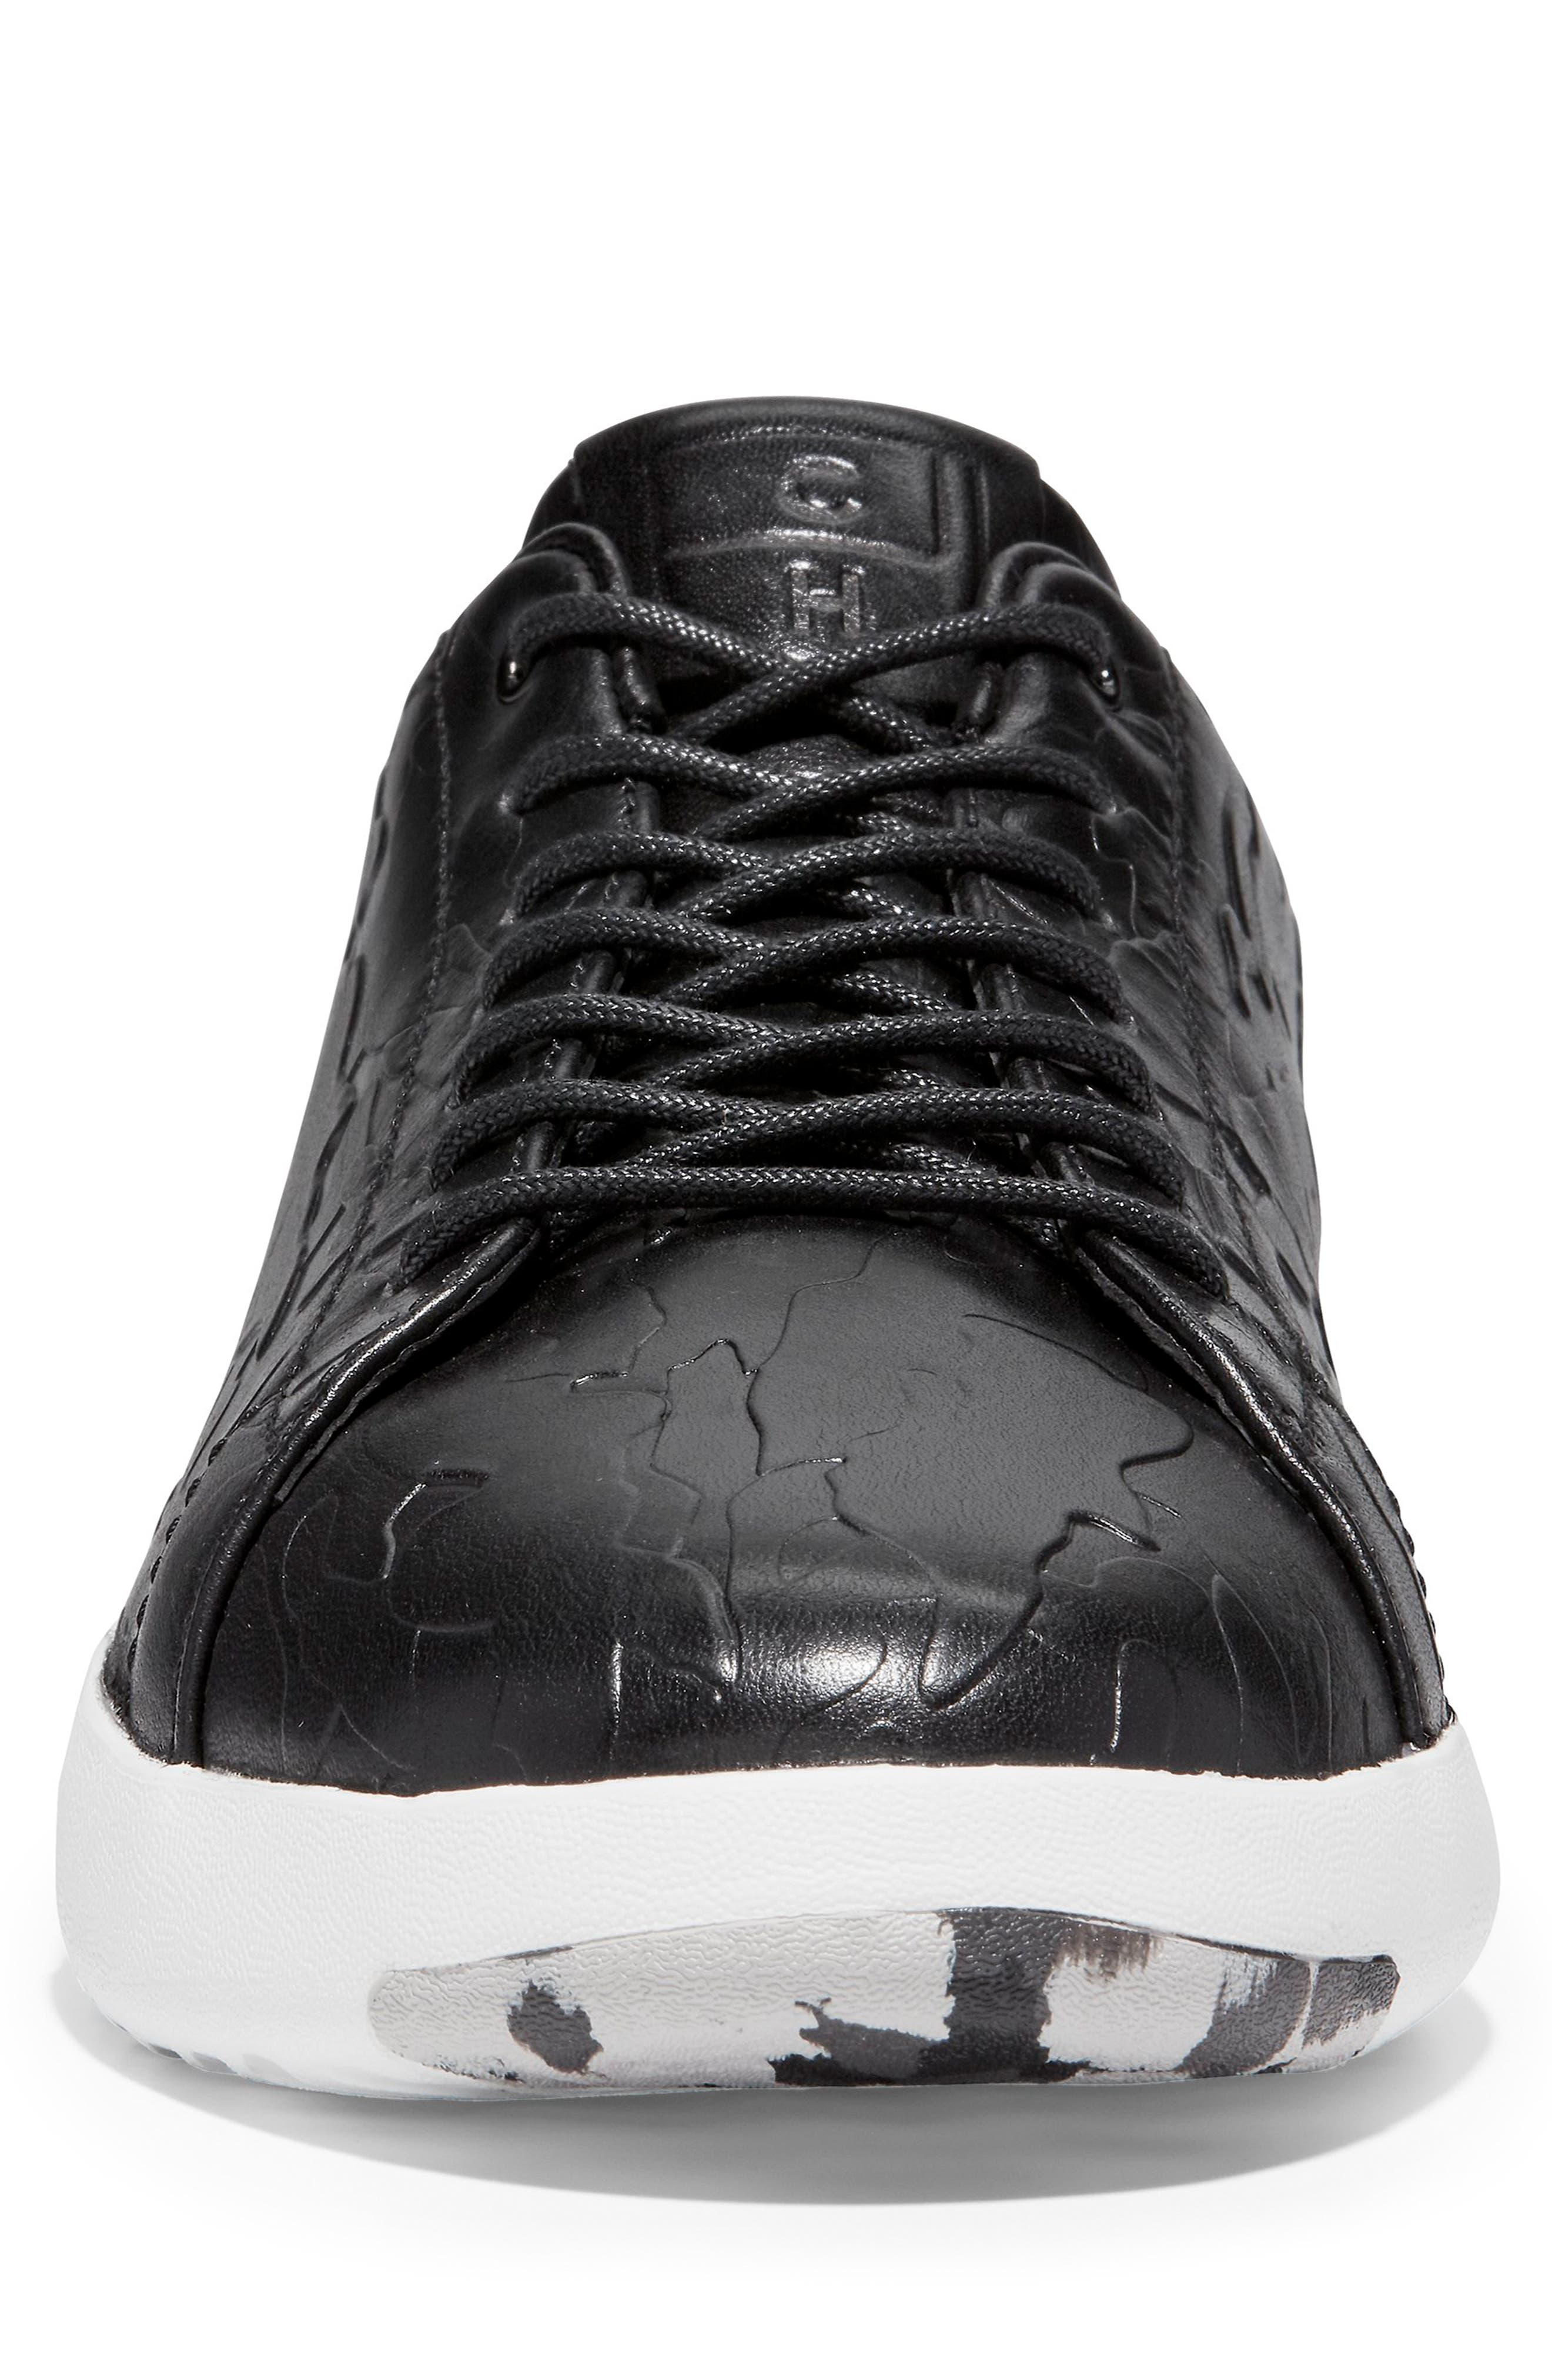 GrandPro Tennis Sneaker,                             Alternate thumbnail 4, color,                             BLACK/ CAMO LEATHER